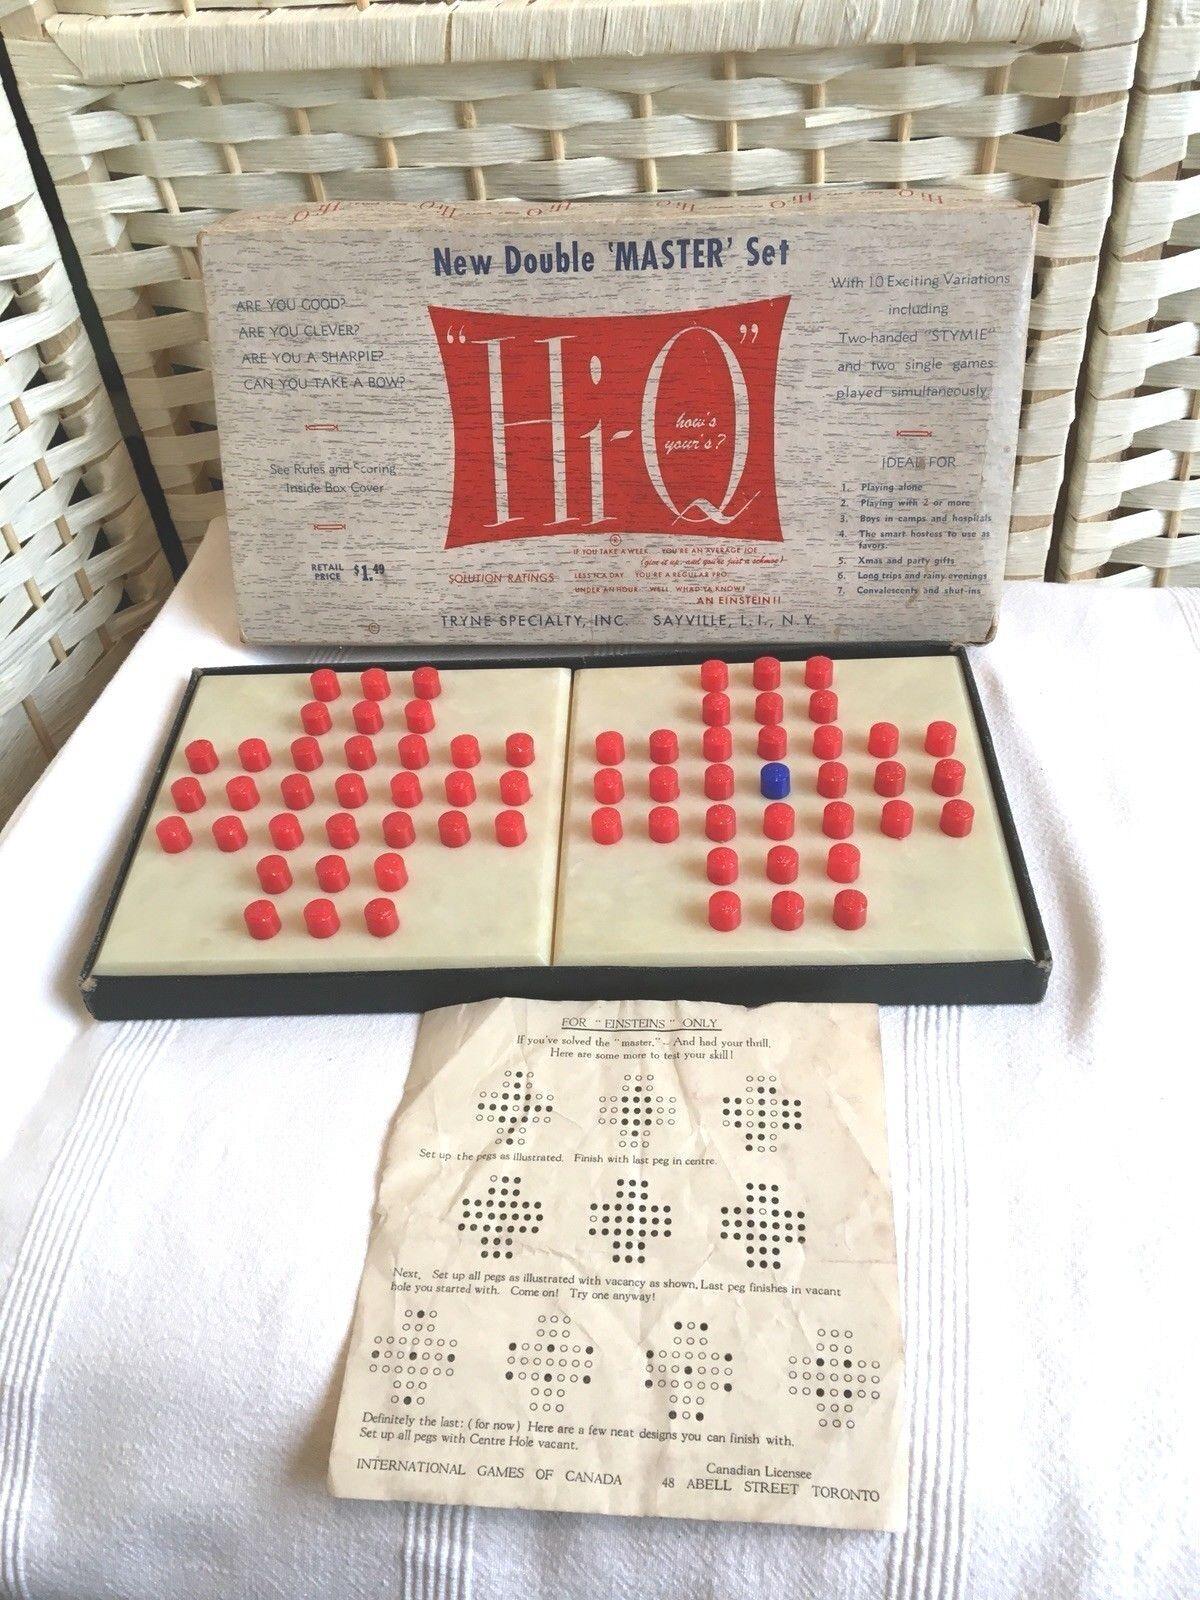 Vintage 1950's Hi Q Double Master Peg Game